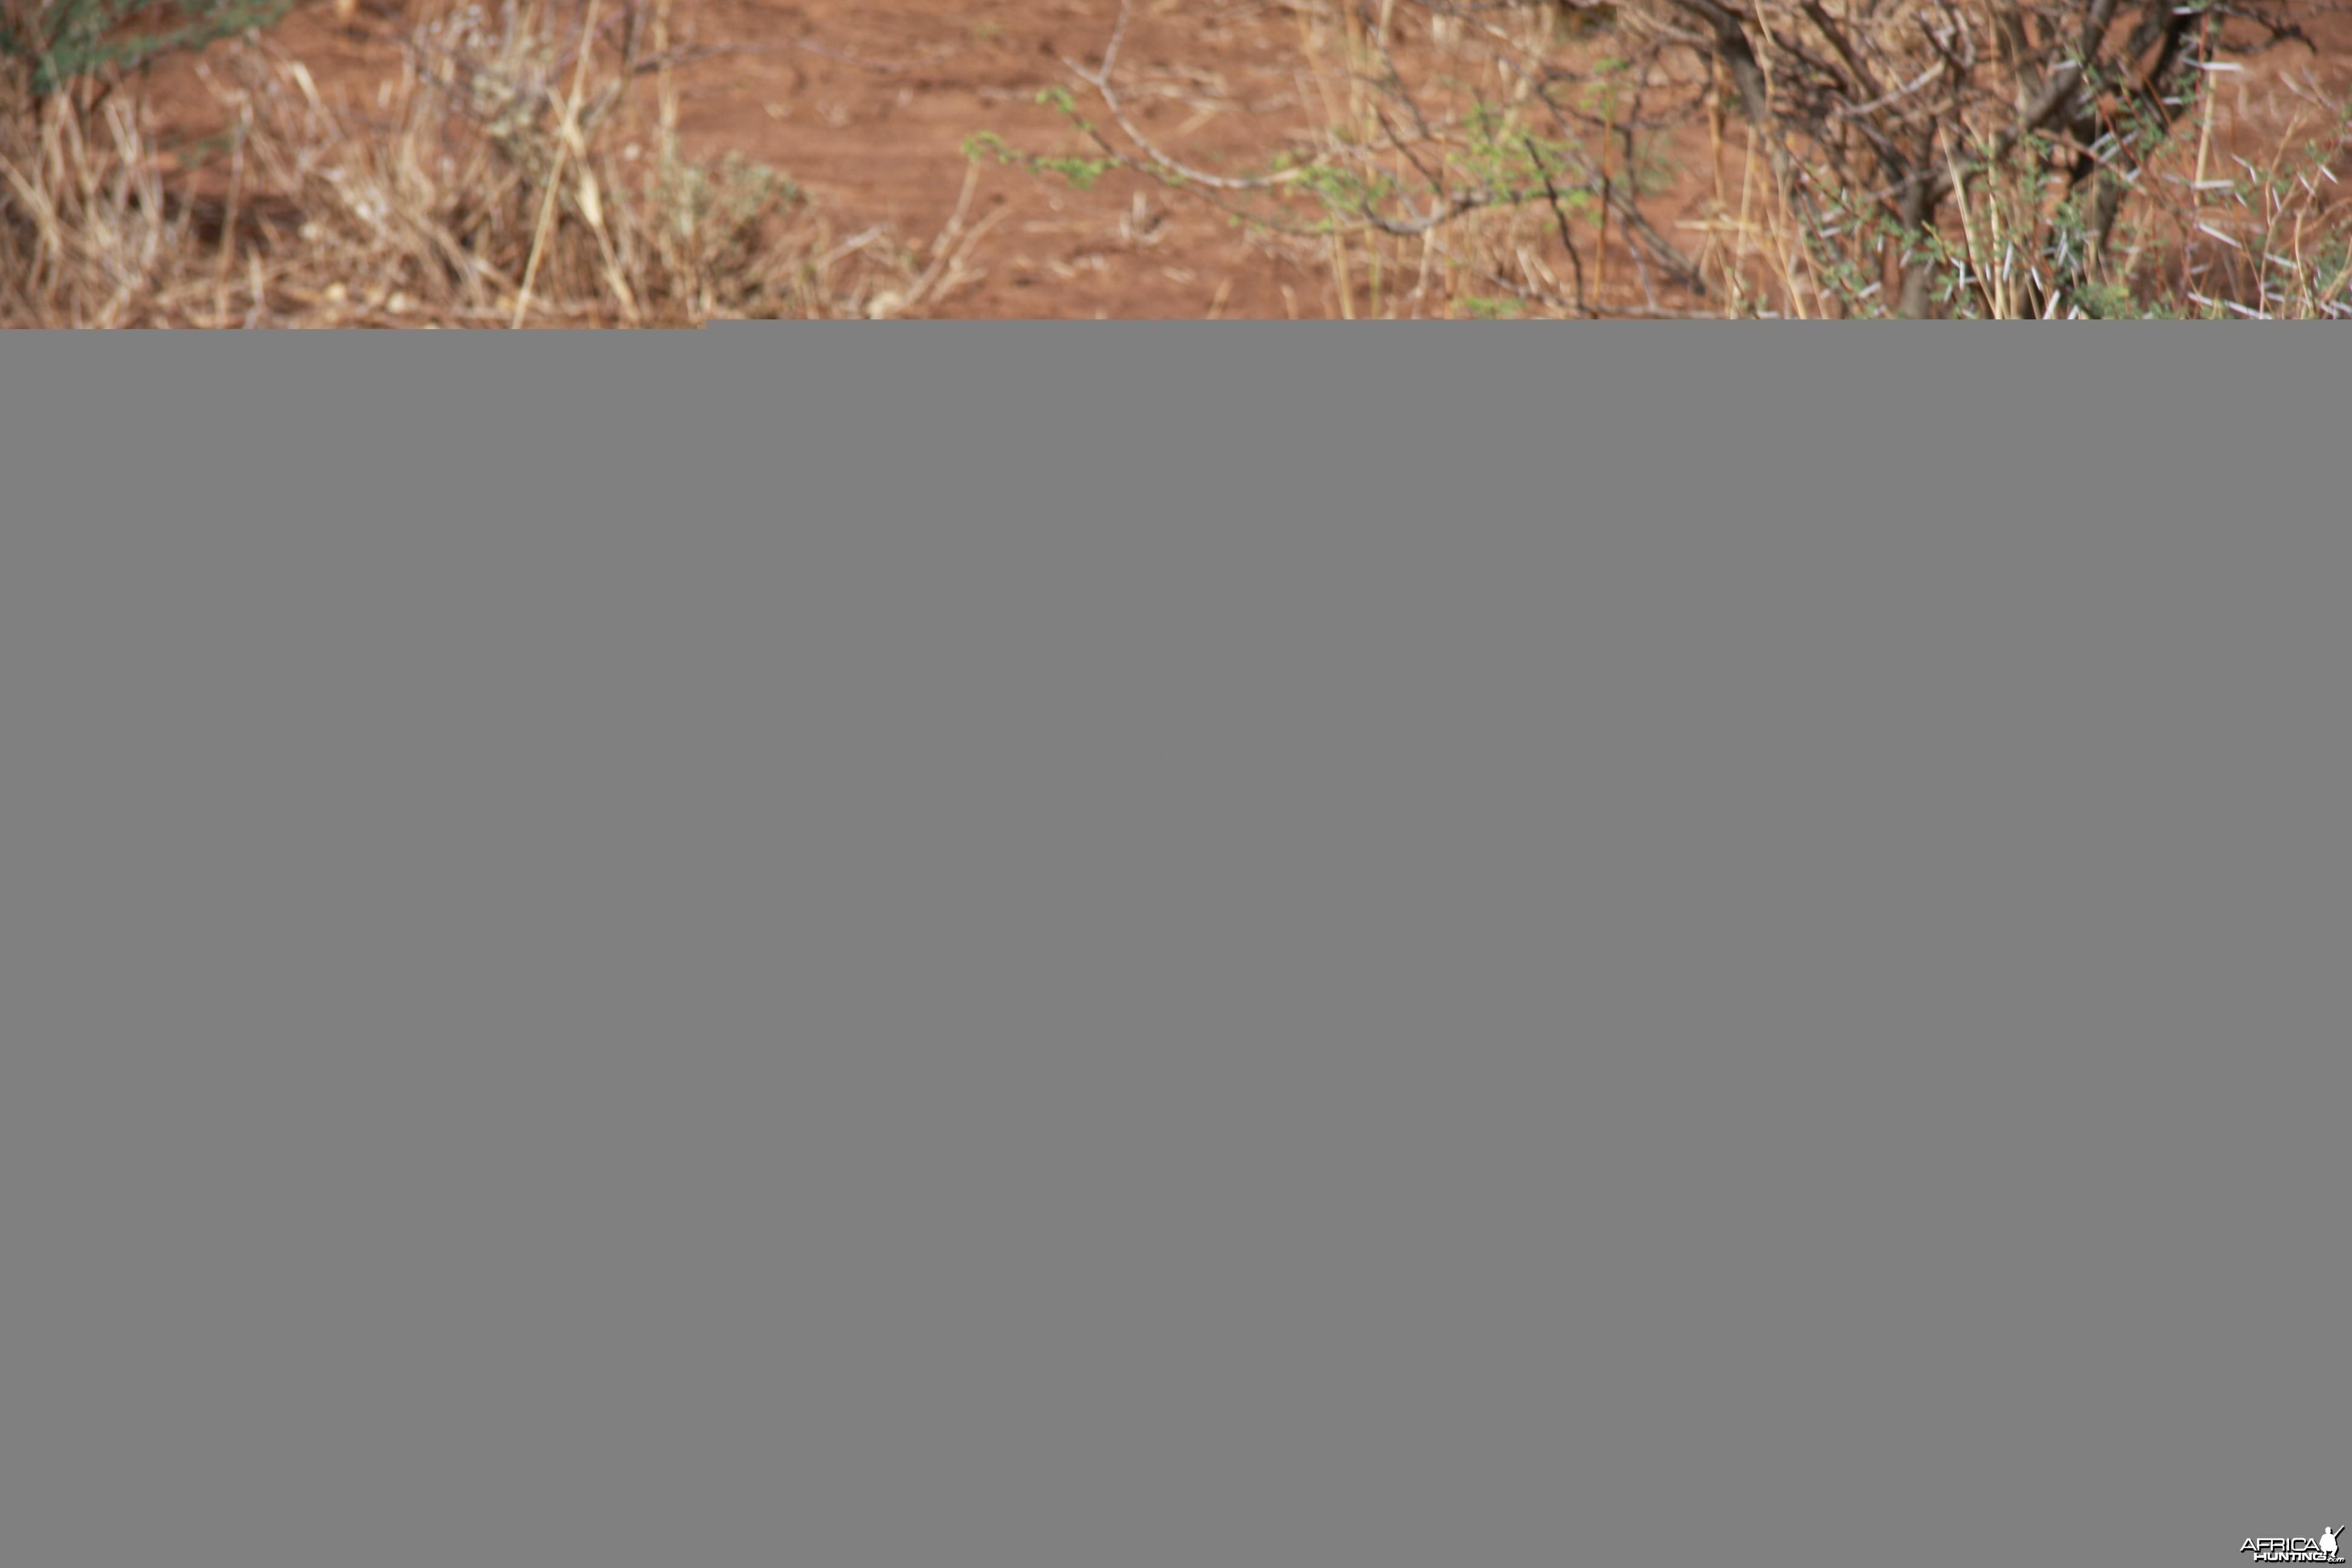 Monitor Lizard Namibia